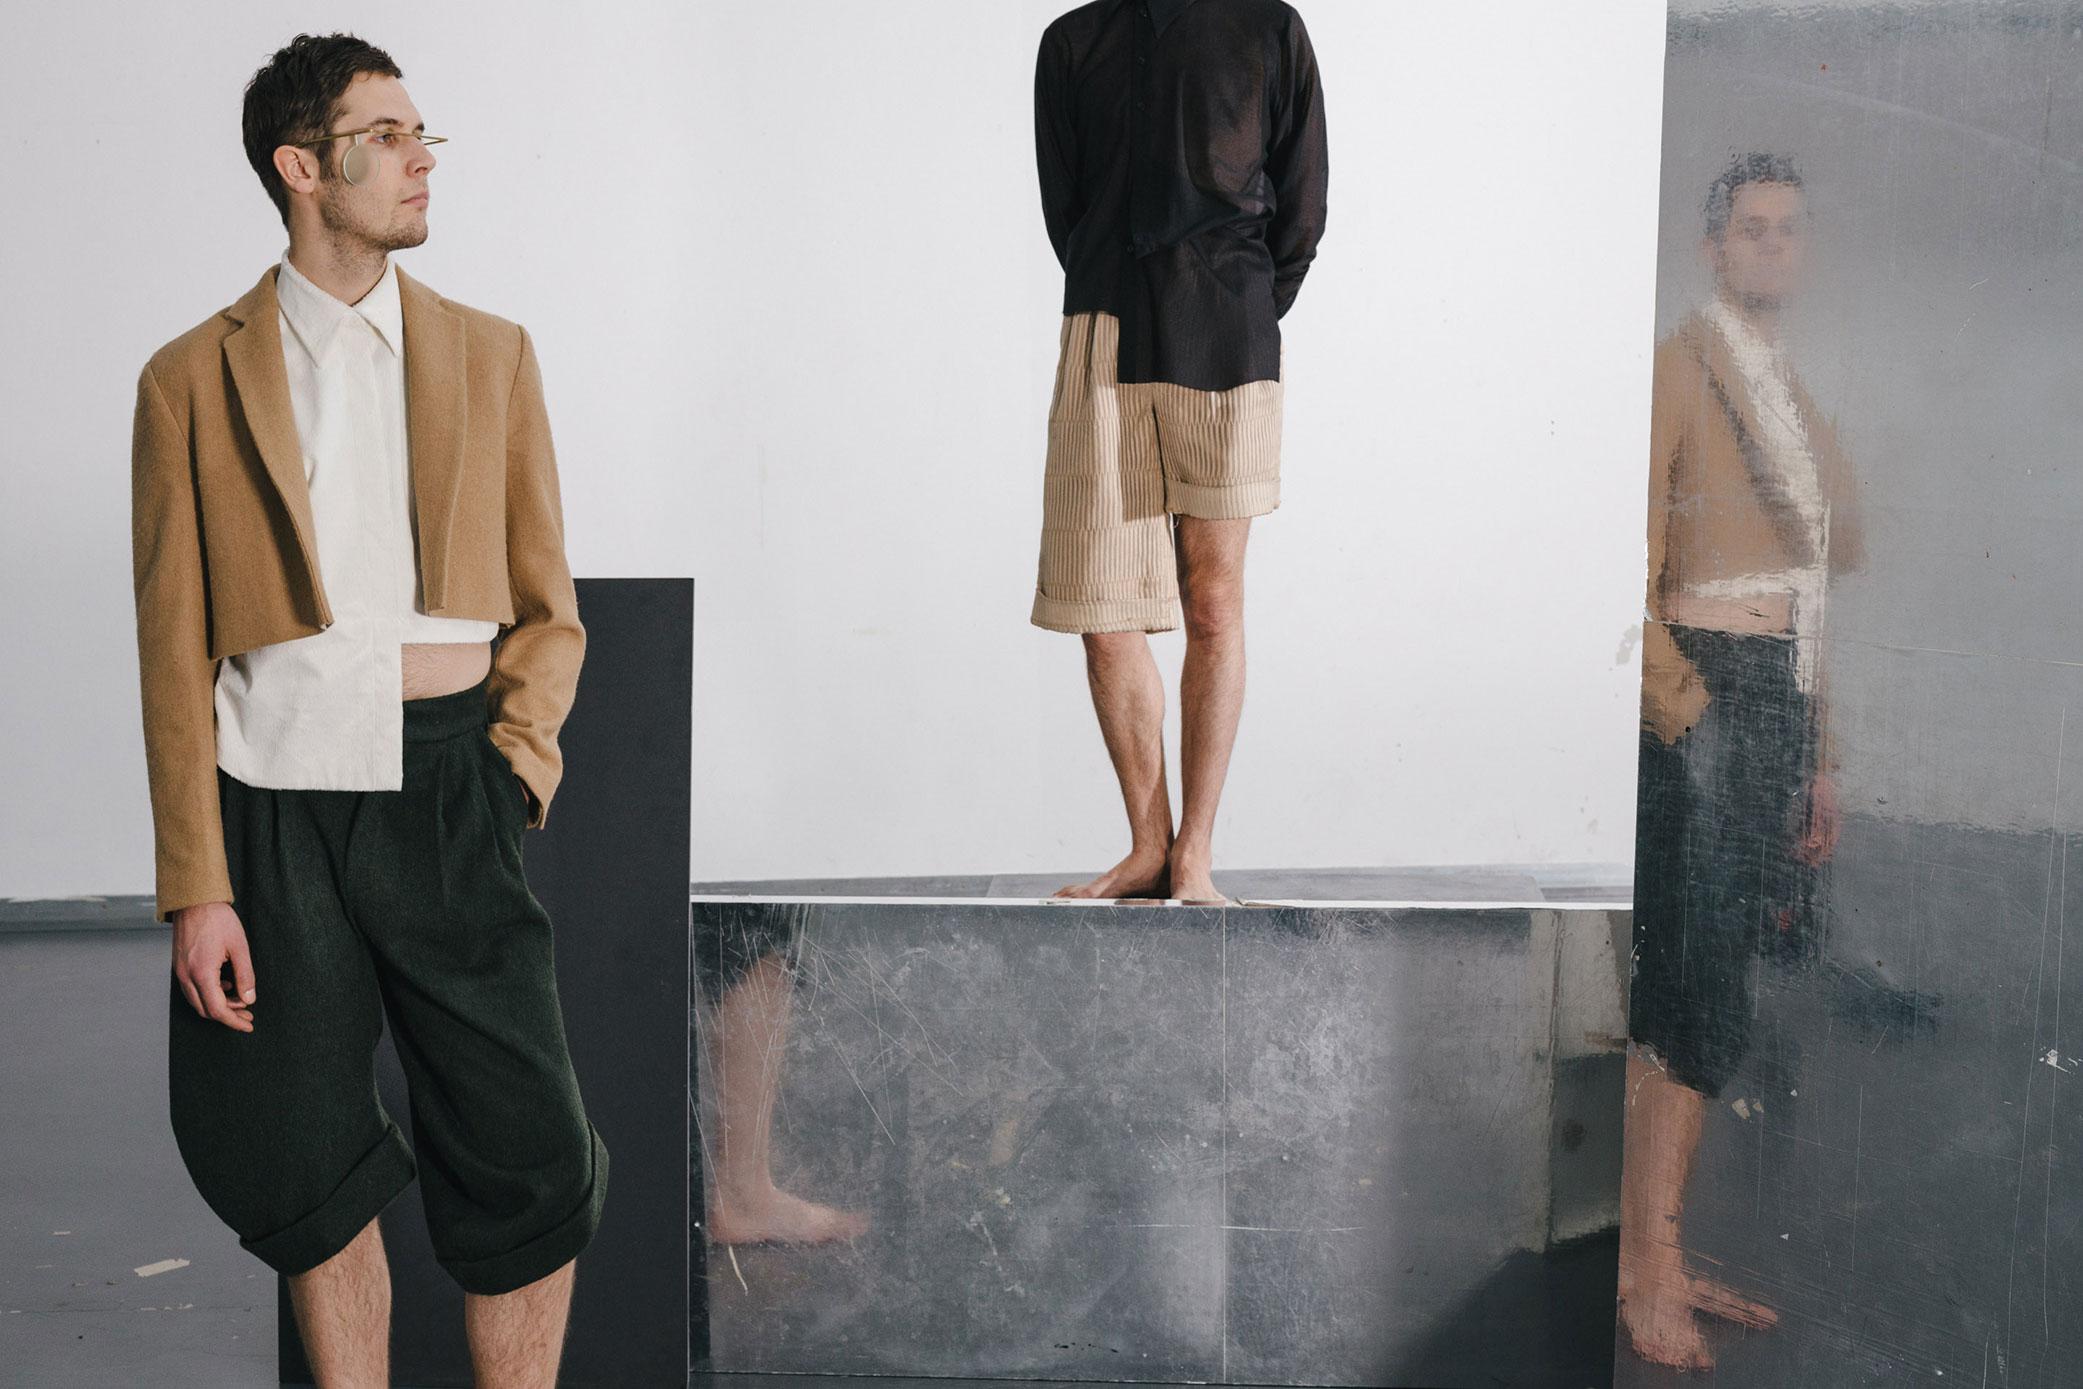 Foto_Stephan-Bögel-Design_Lone-Philipp_oops_OKS